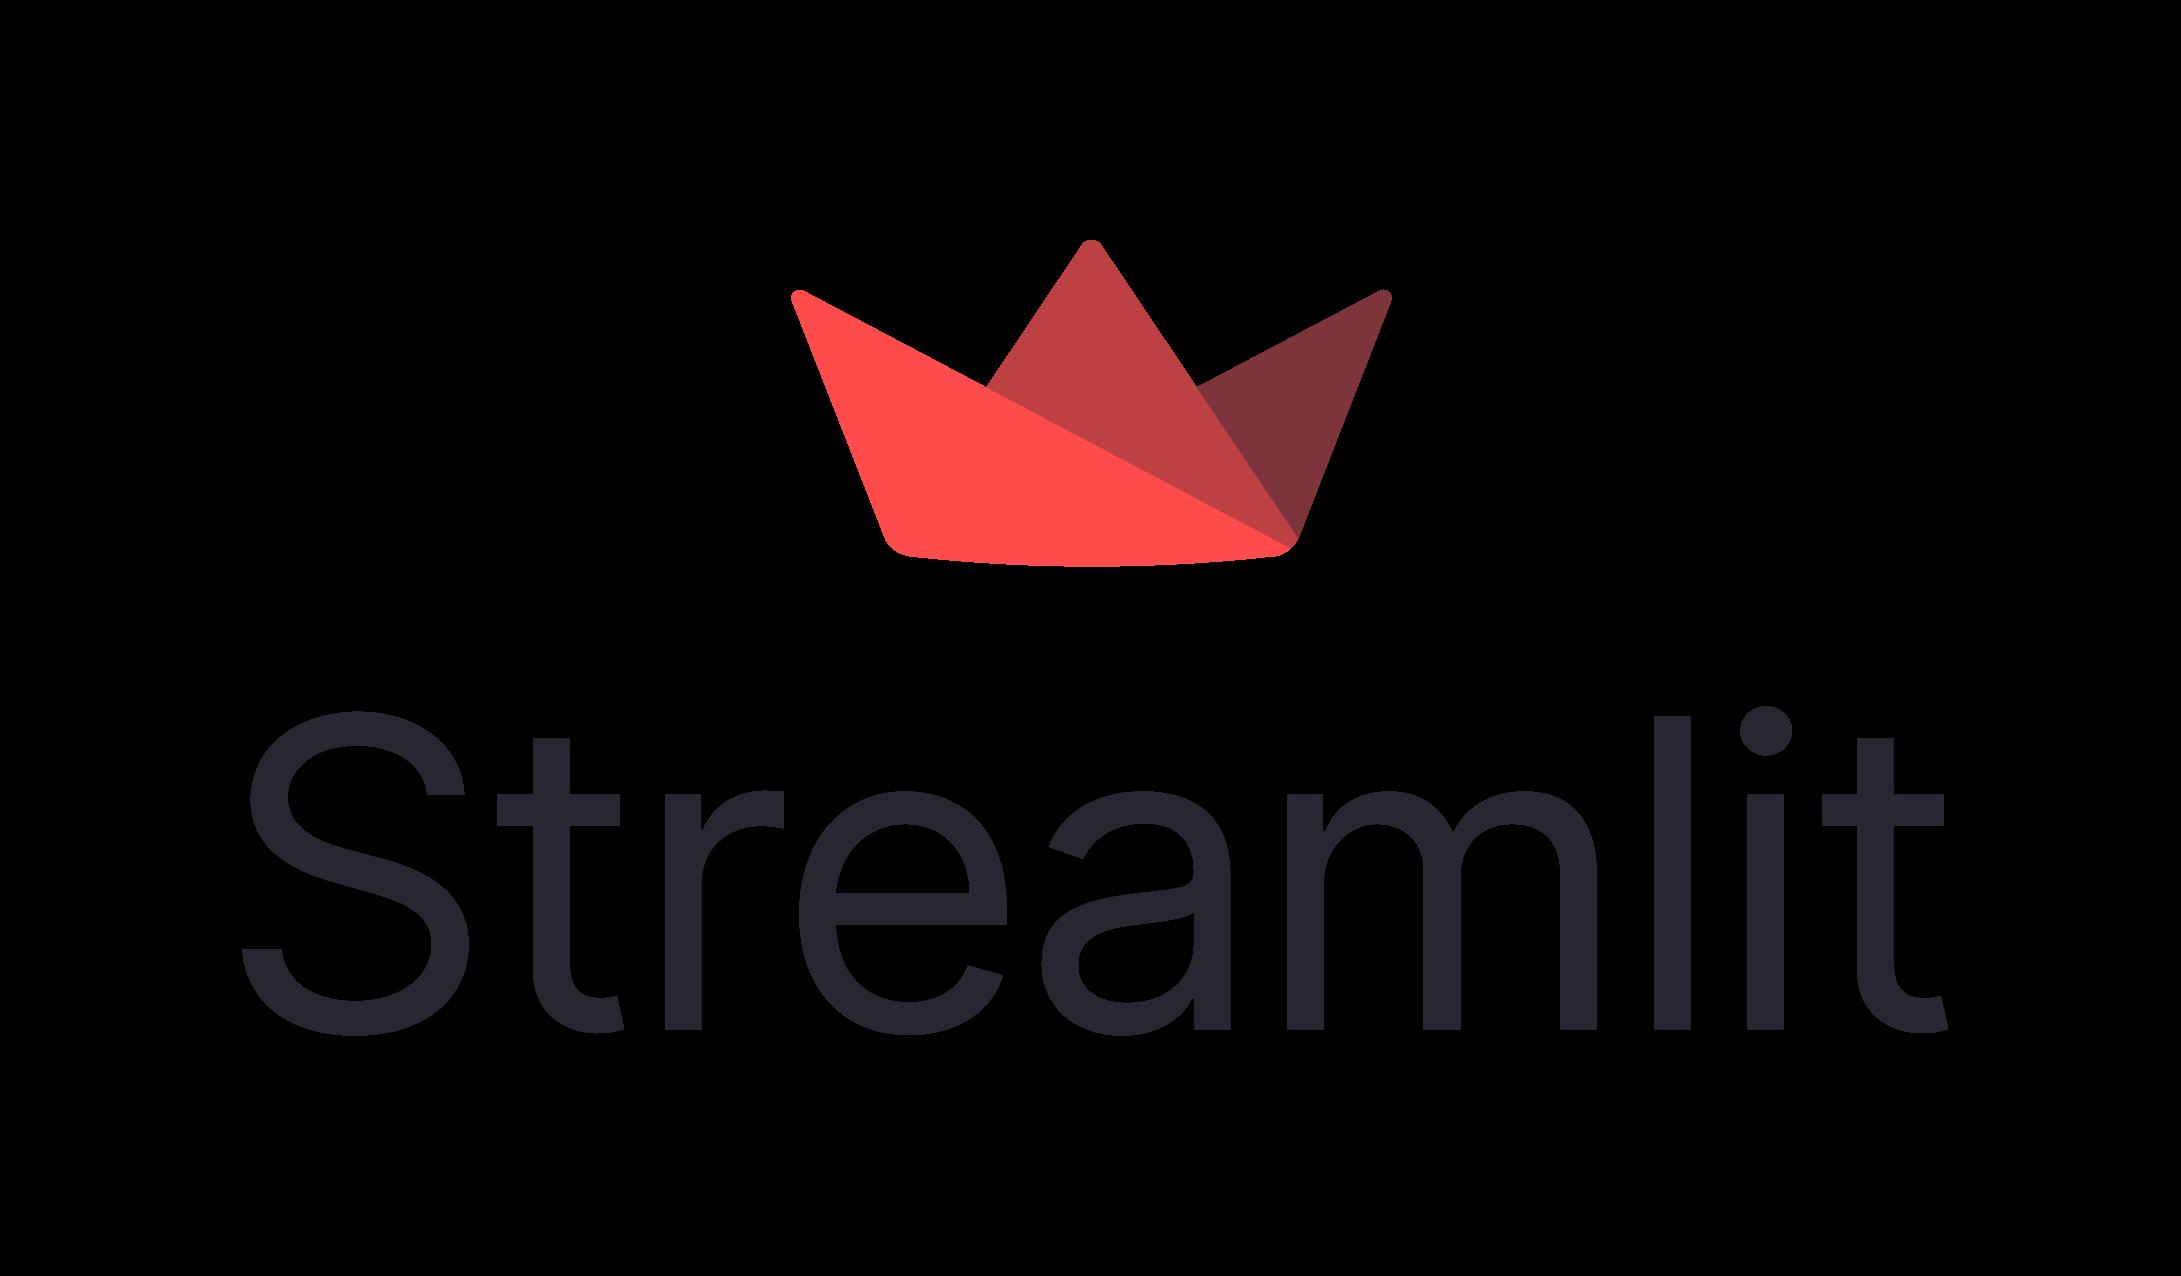 Streamlit logo on light background